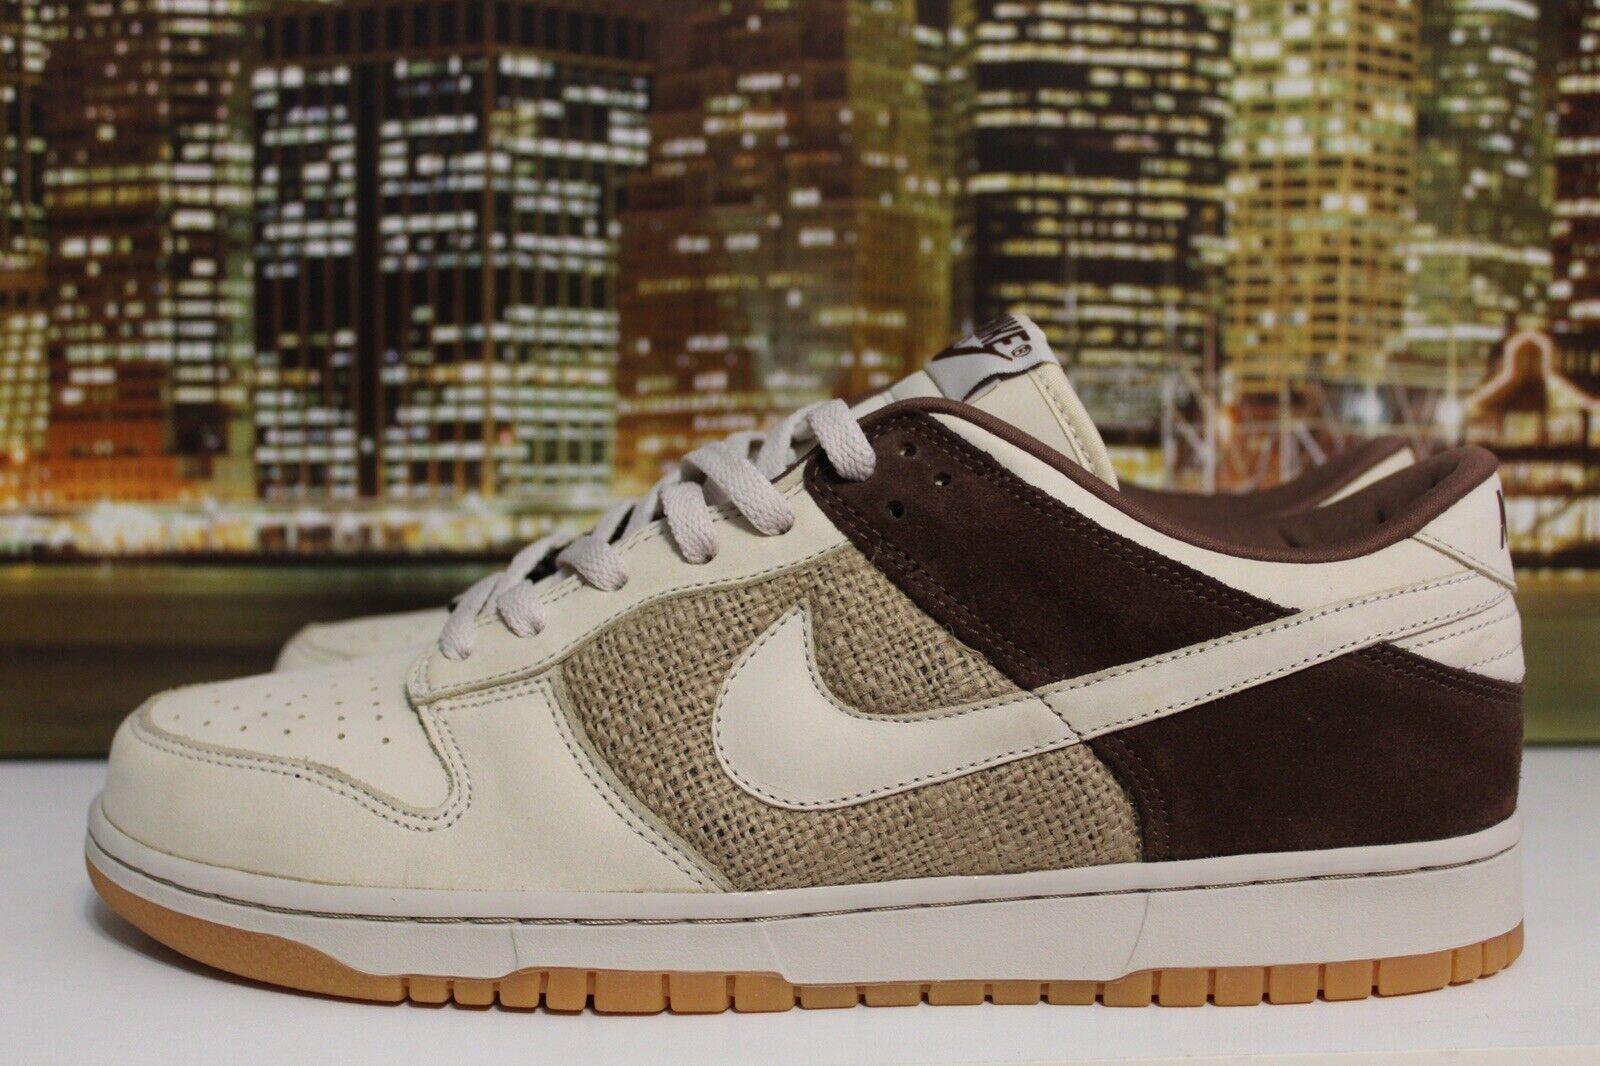 Nike Dunk Low Mushroom Birch Hemp Brown Beige Gum 2005 Sneakers Size 12